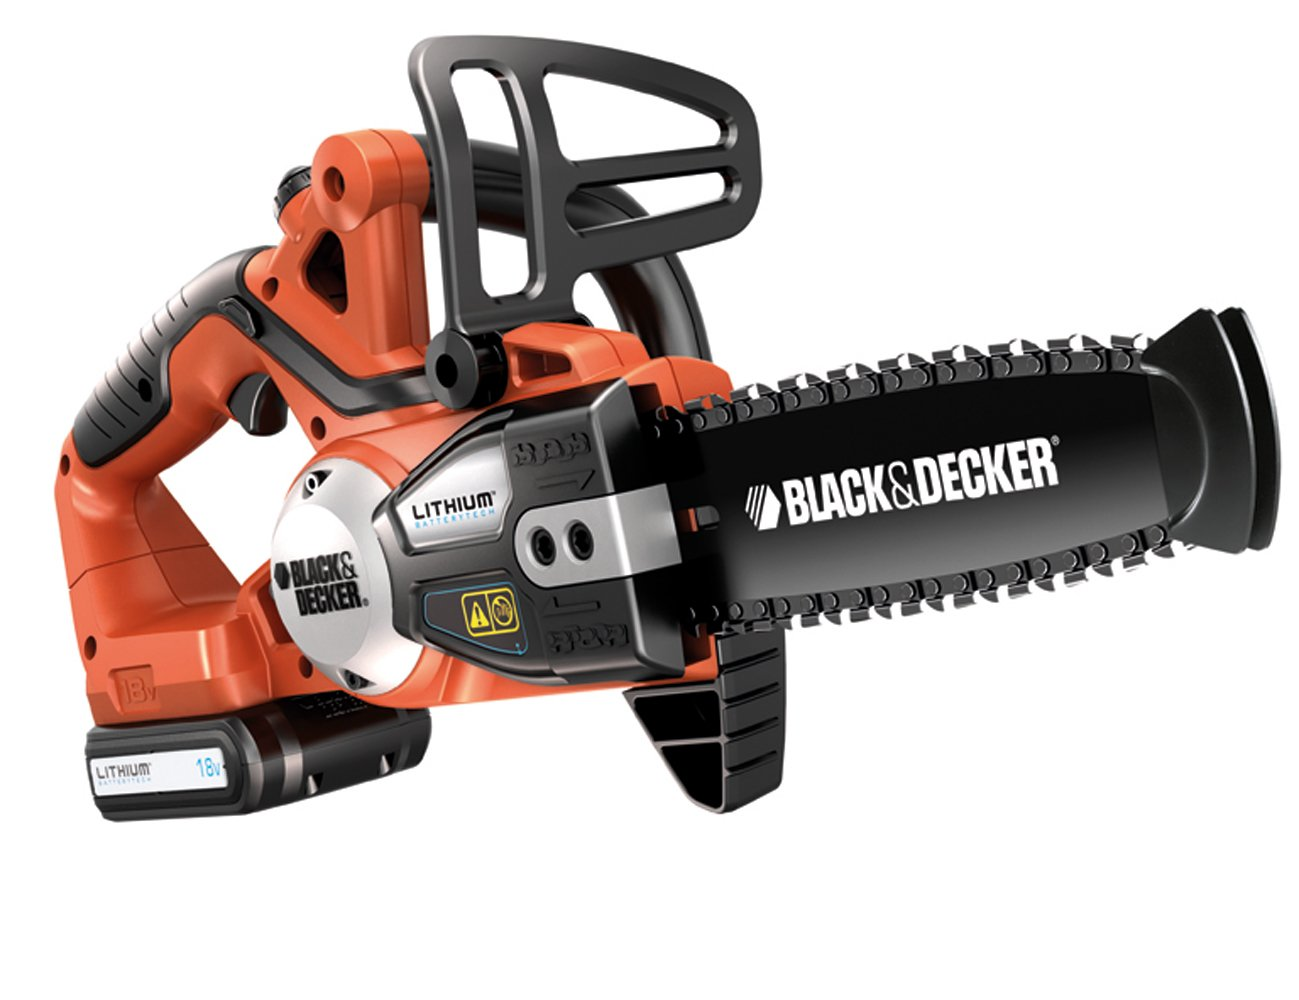 Black + Decker Black + Decker Akku-Kettensäge GKC1820L orange